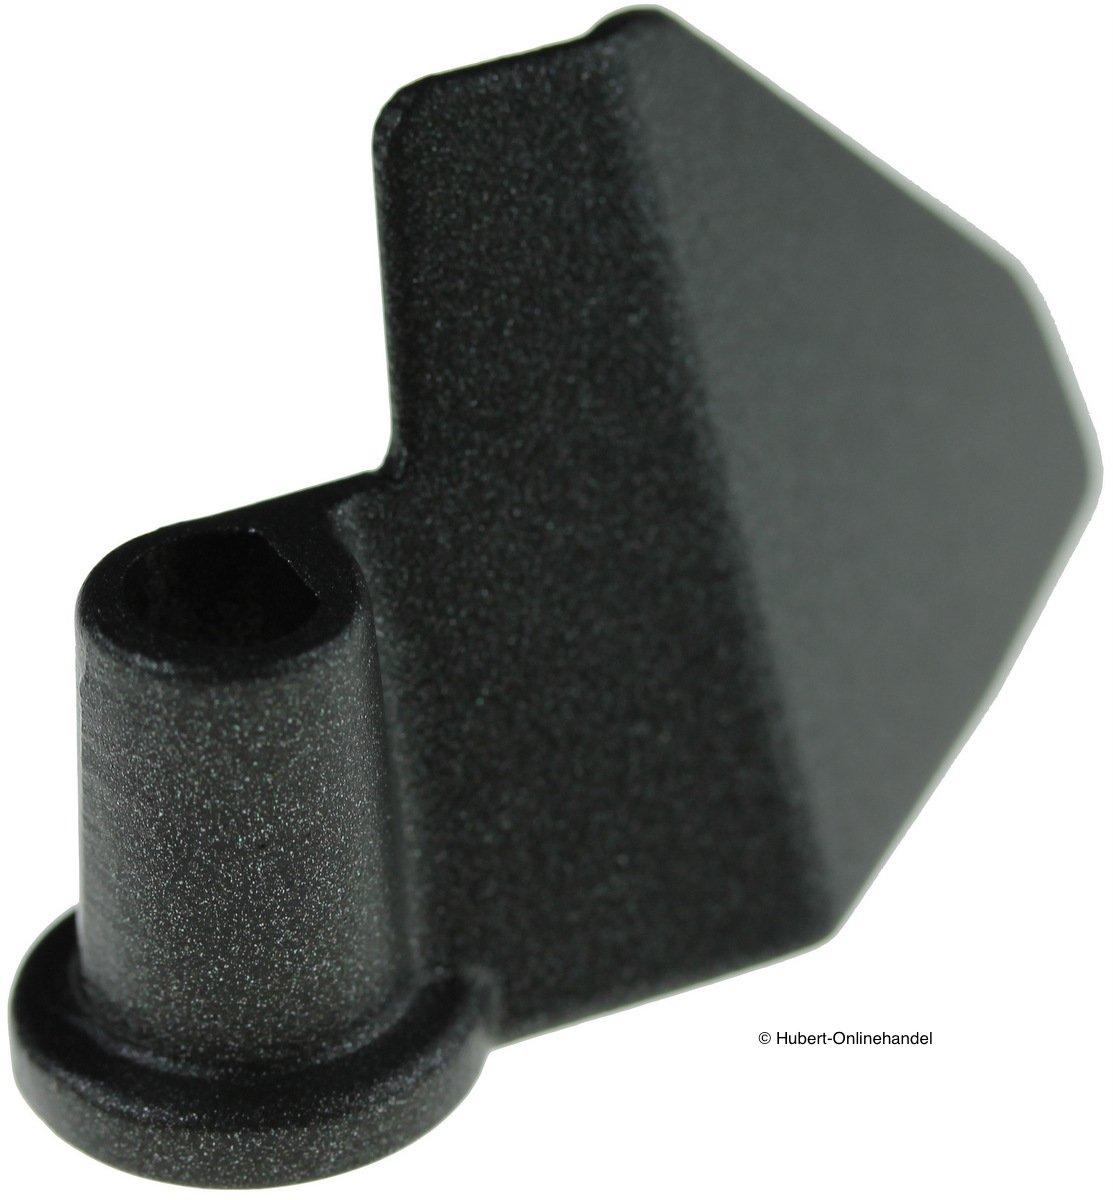 AFK - Ganchos para amasar (8730815) para panificadora automáticas BM de 2, BM de 2 N, BM de 21, BME de 600: Amazon.es: Hogar